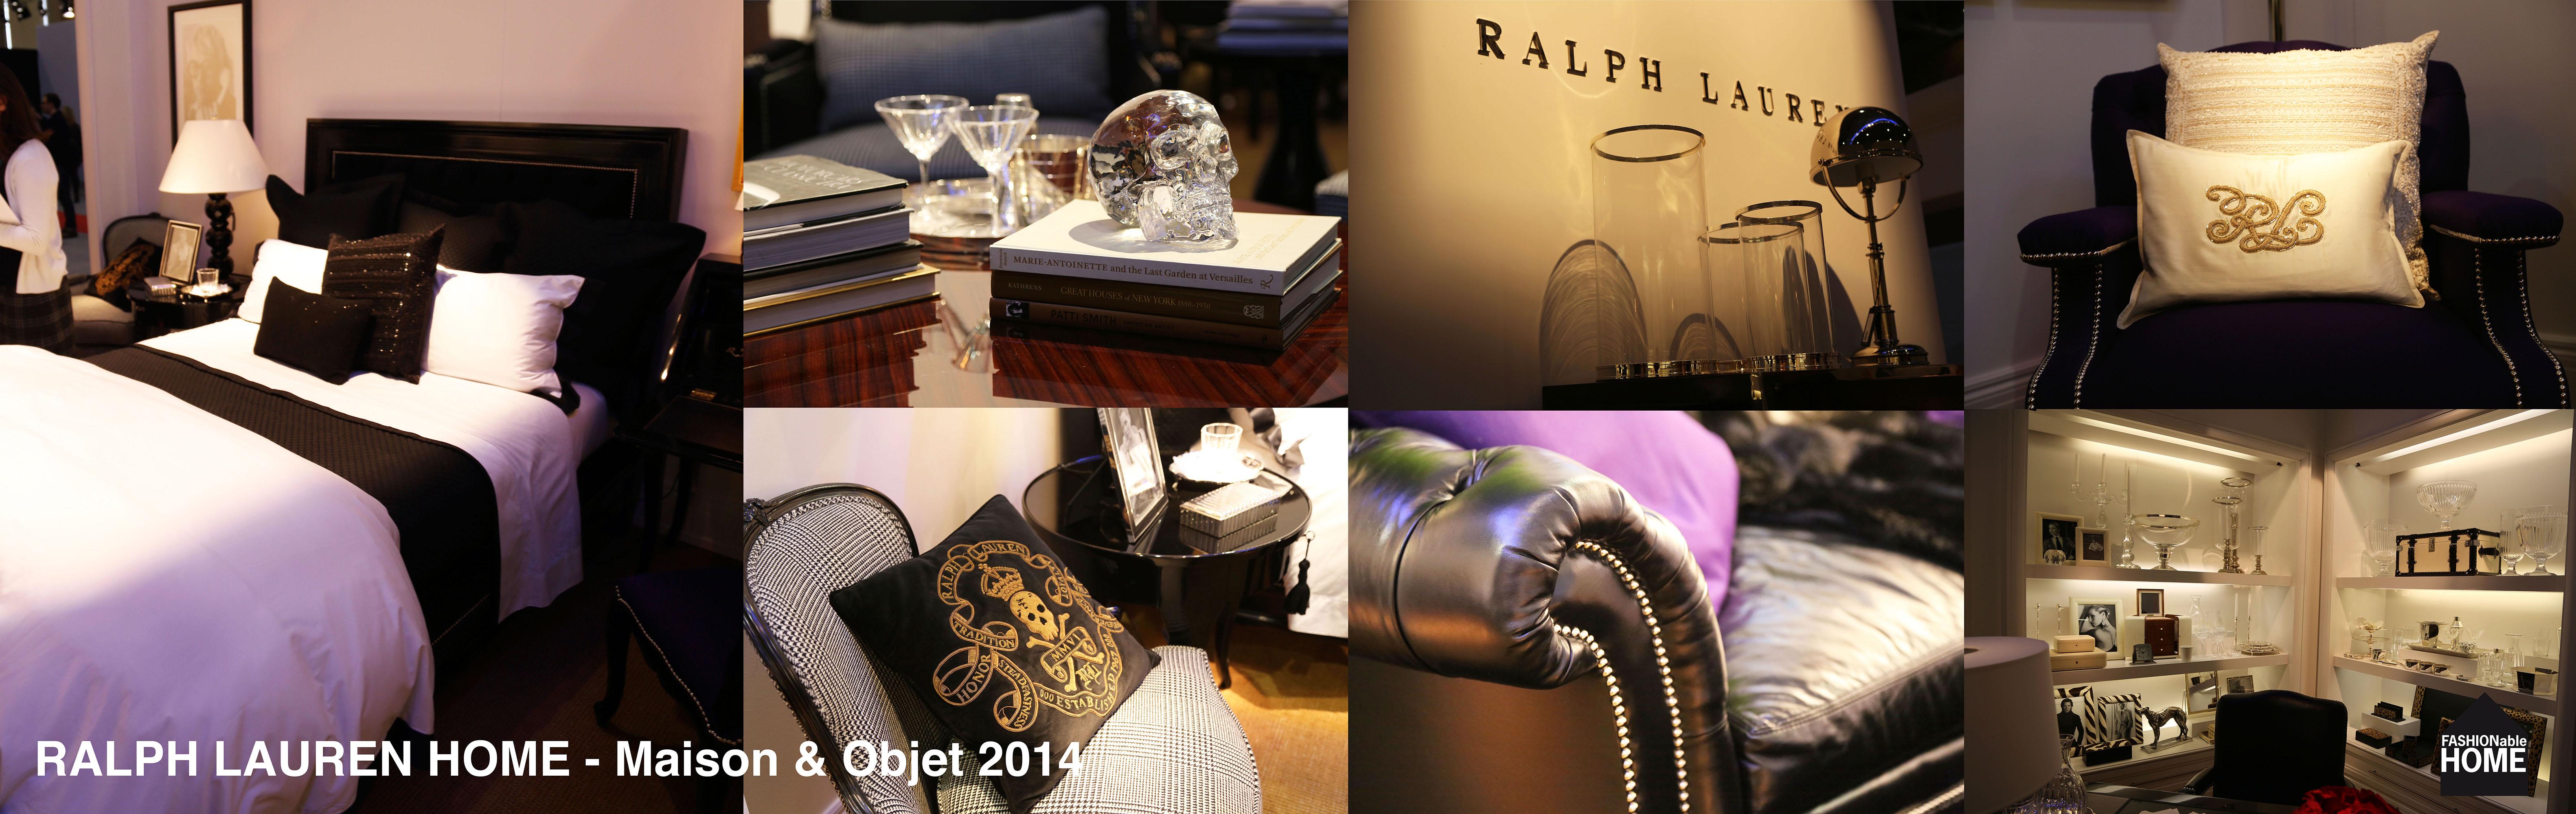 Ralph Lauren Home Maison Objet 2014 Fashionable Home Blog